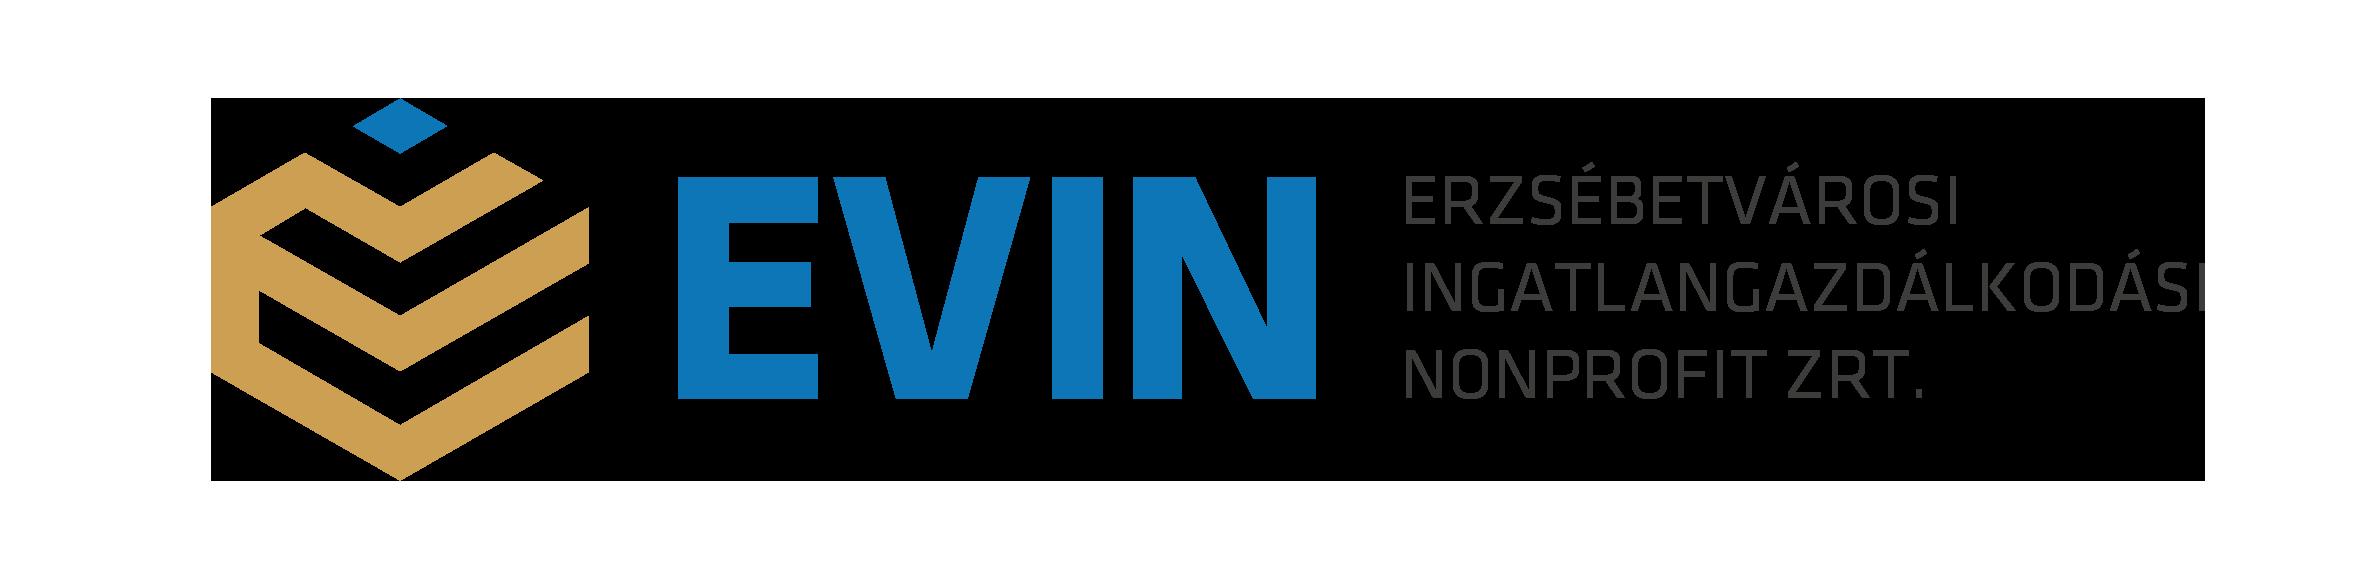 EVIN Nonprofit Zrt.